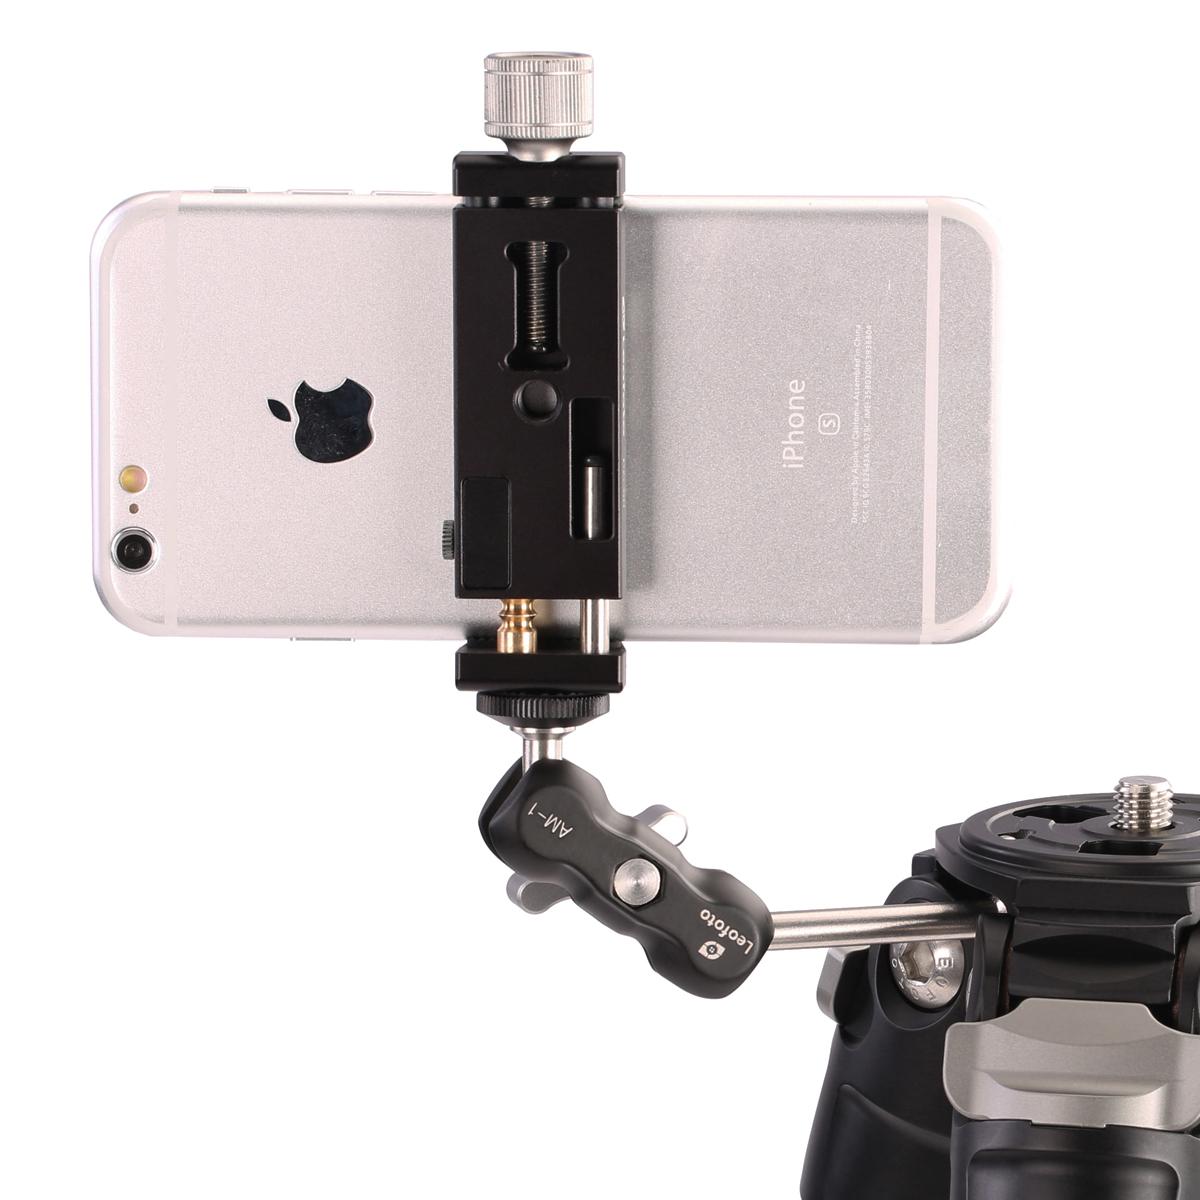 Brazo articulado Leofoto AM-1 de Leofoto con smartphone